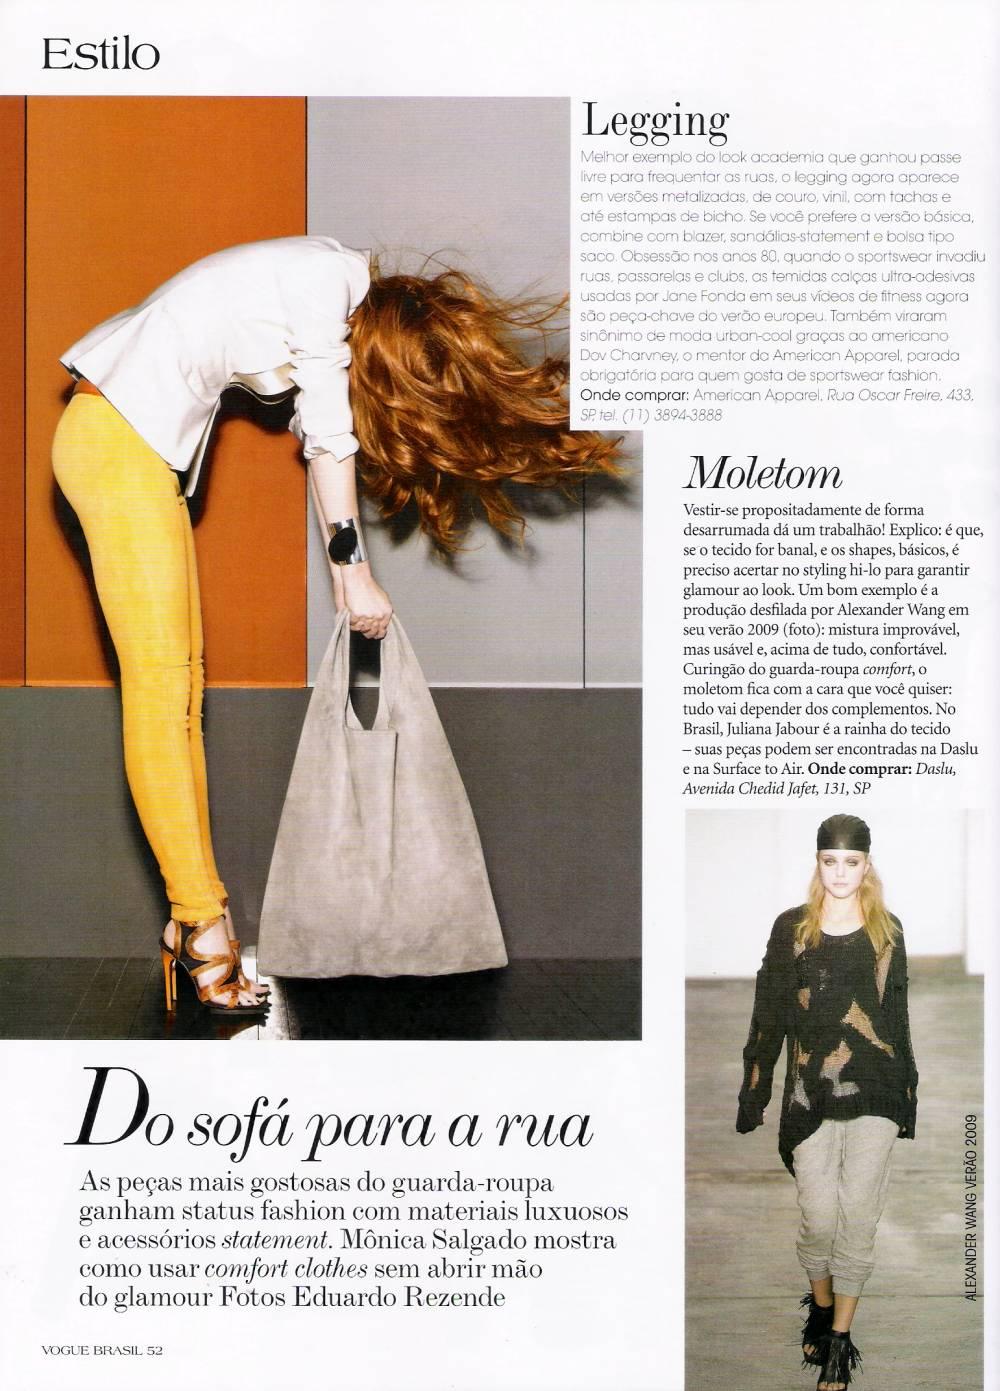 04516_VogueBrasil_Julho2009_VanessaMichels_phEduardoRezende_01_122_153lo.jpg